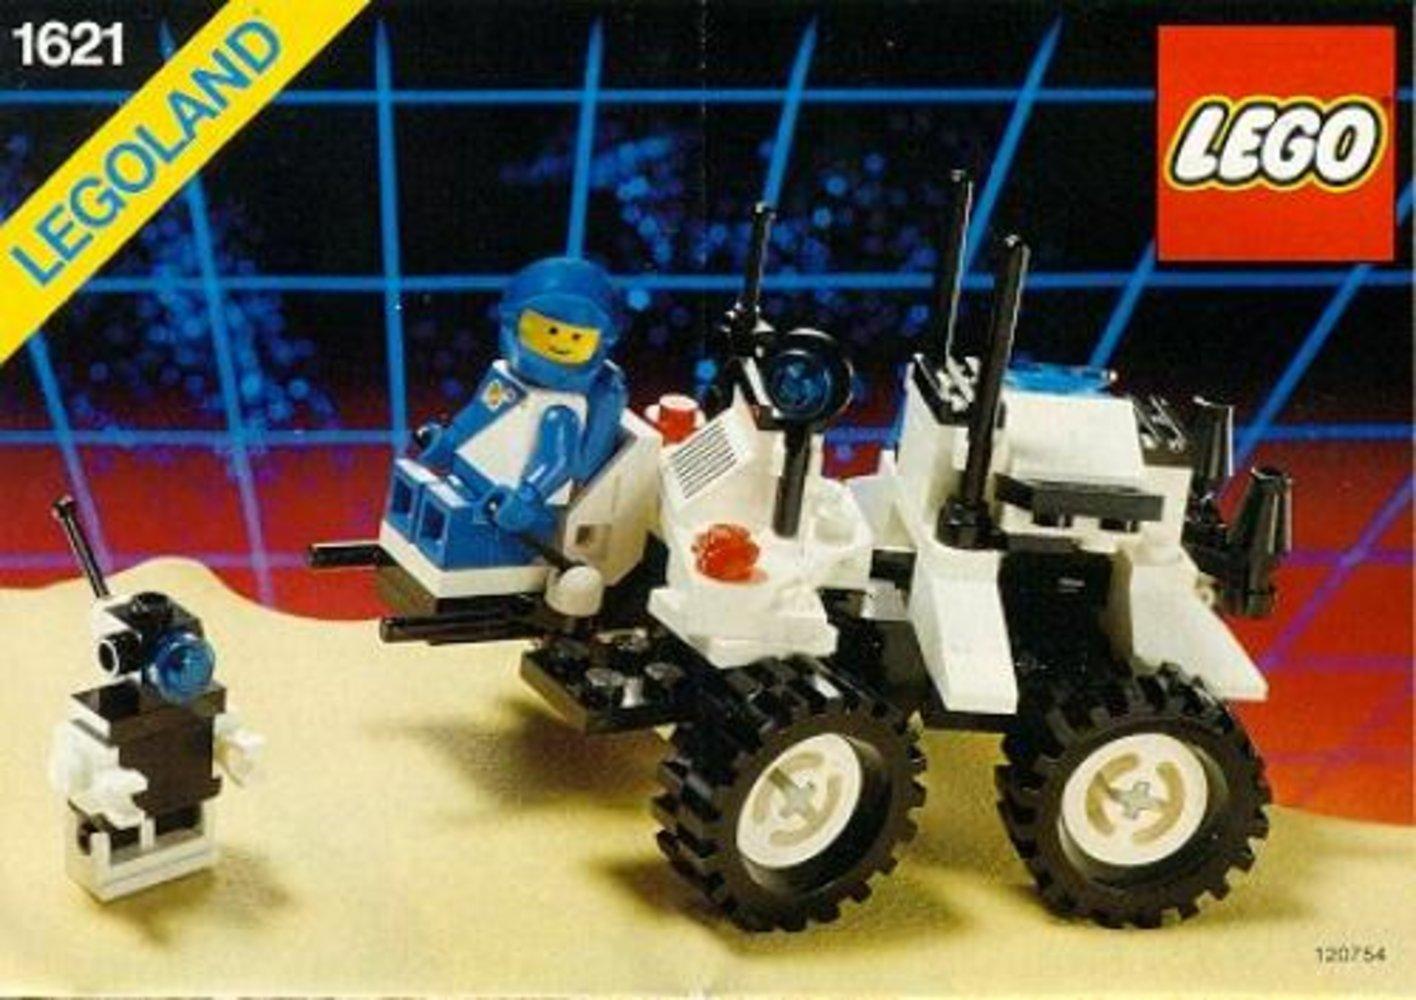 Lunar MPV Vehicle